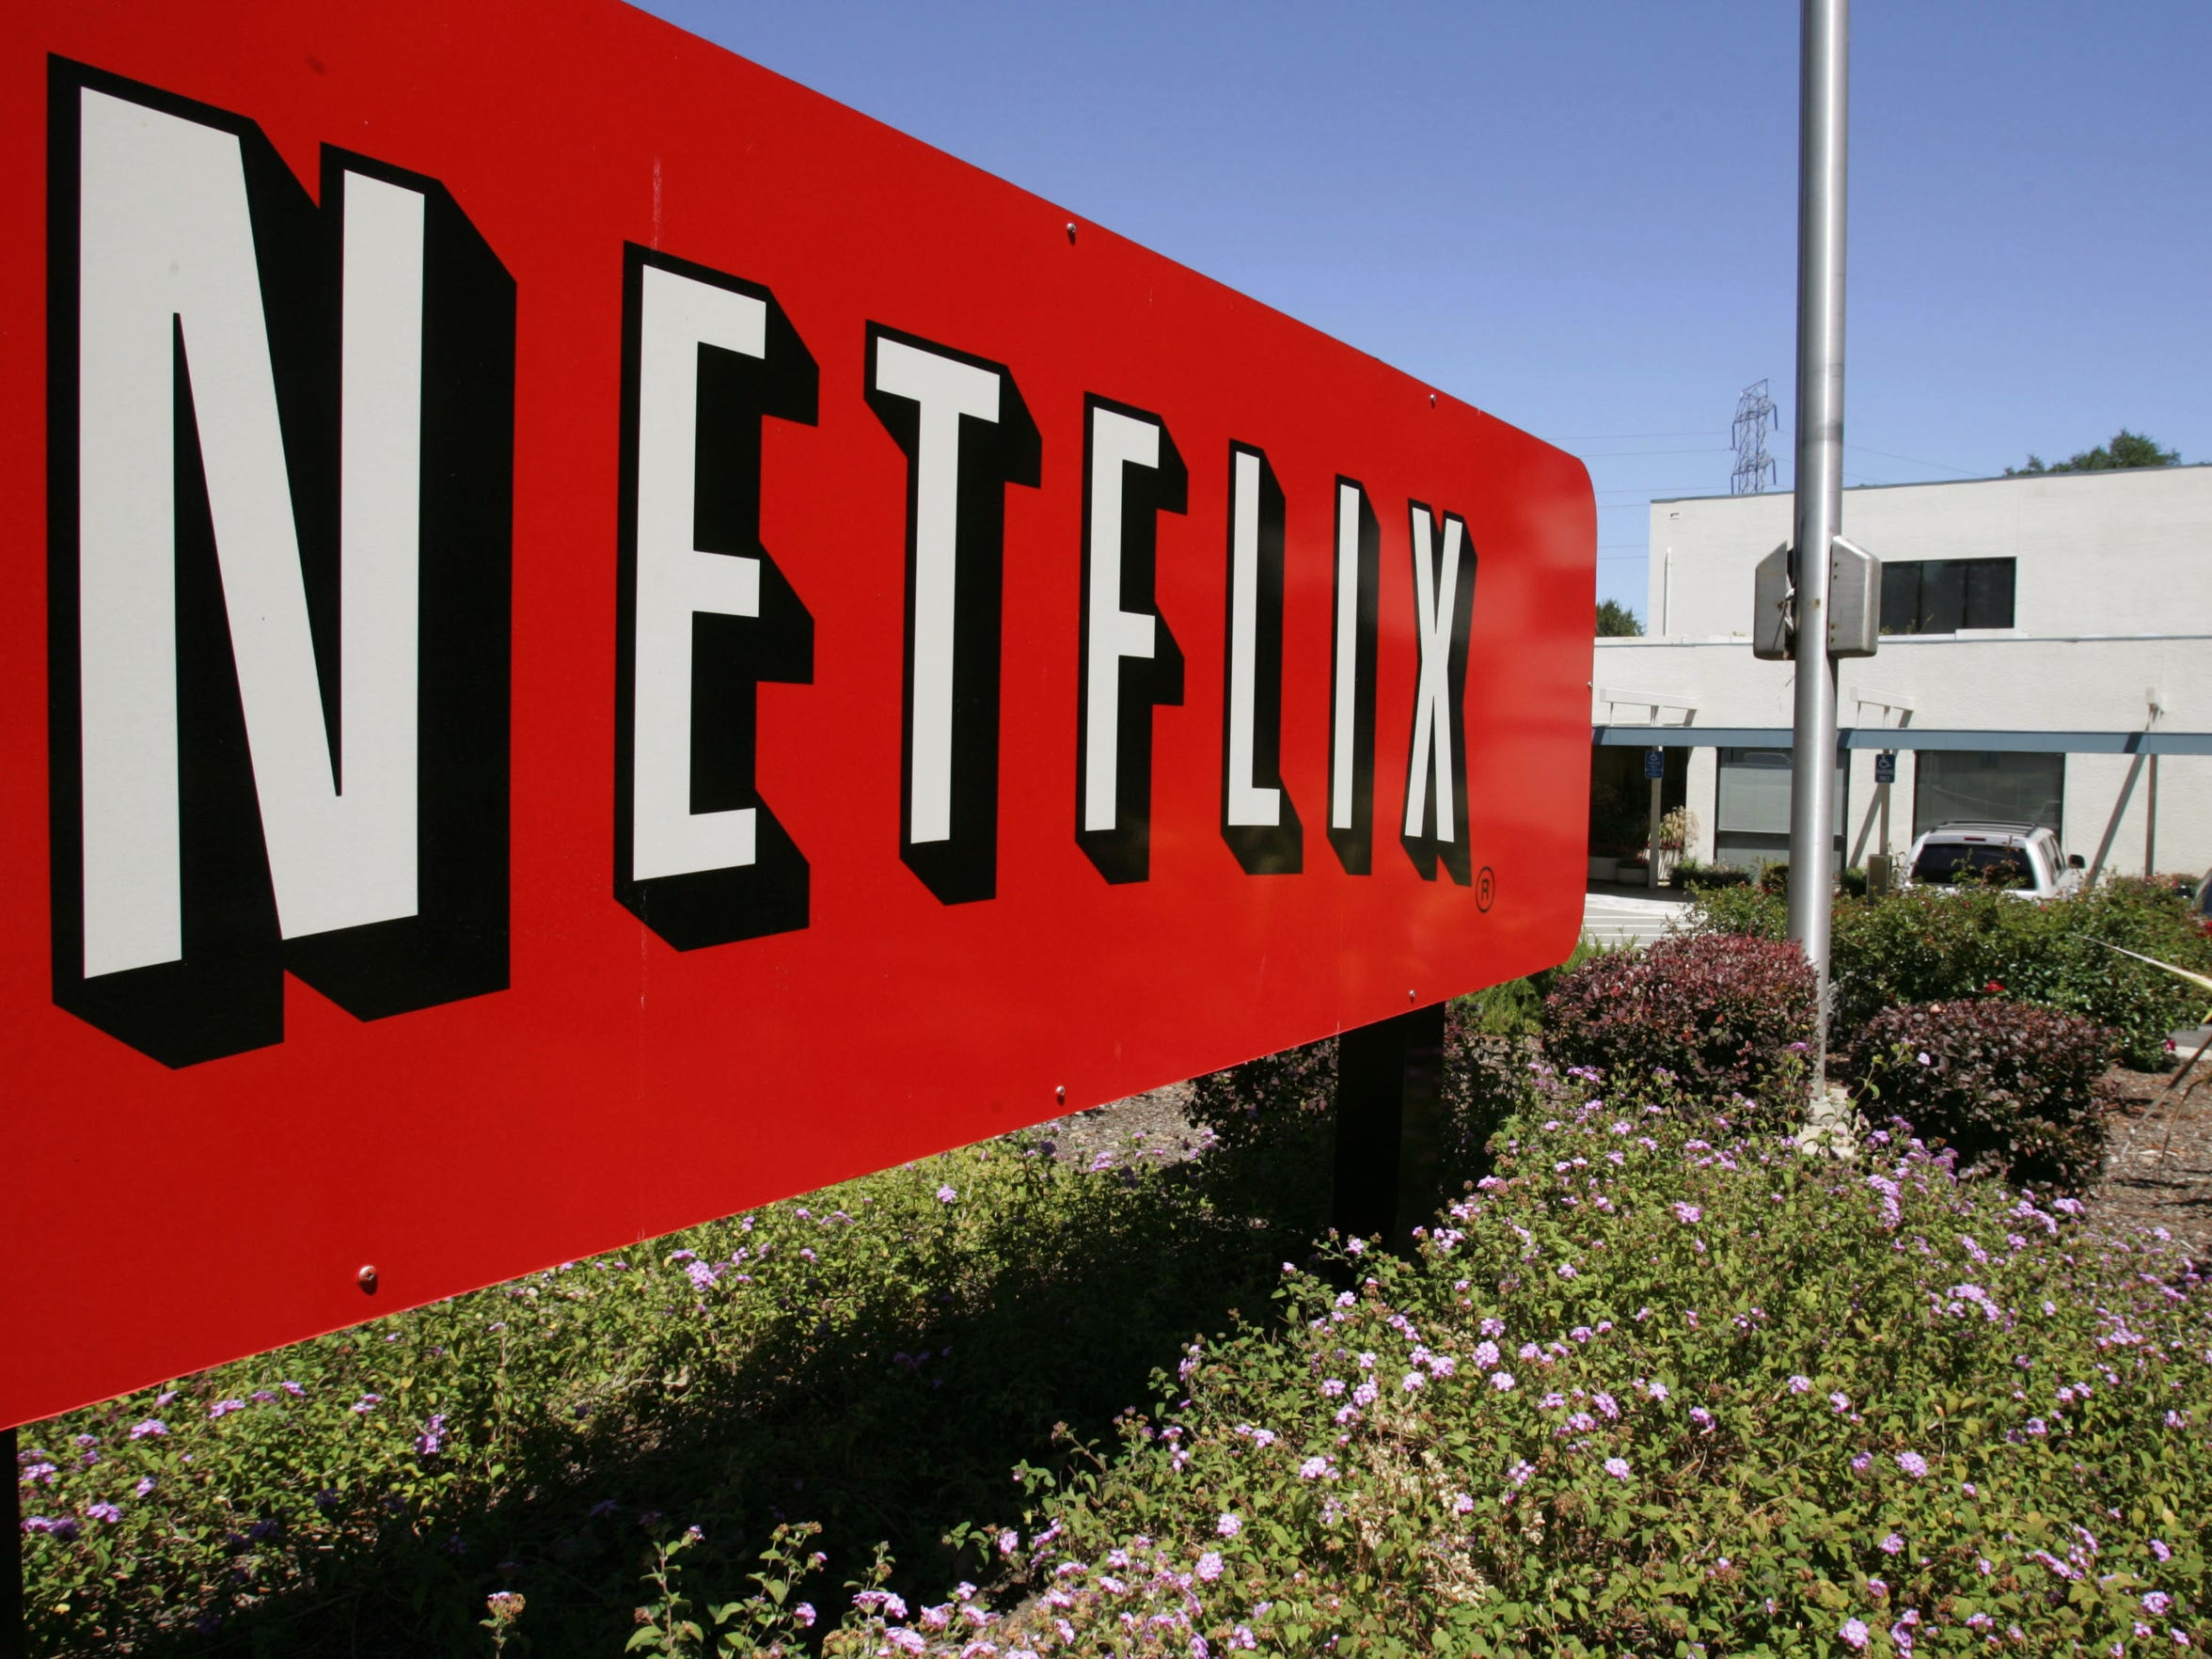 Fame anticipated as Jason Bateman's Netflix series explores